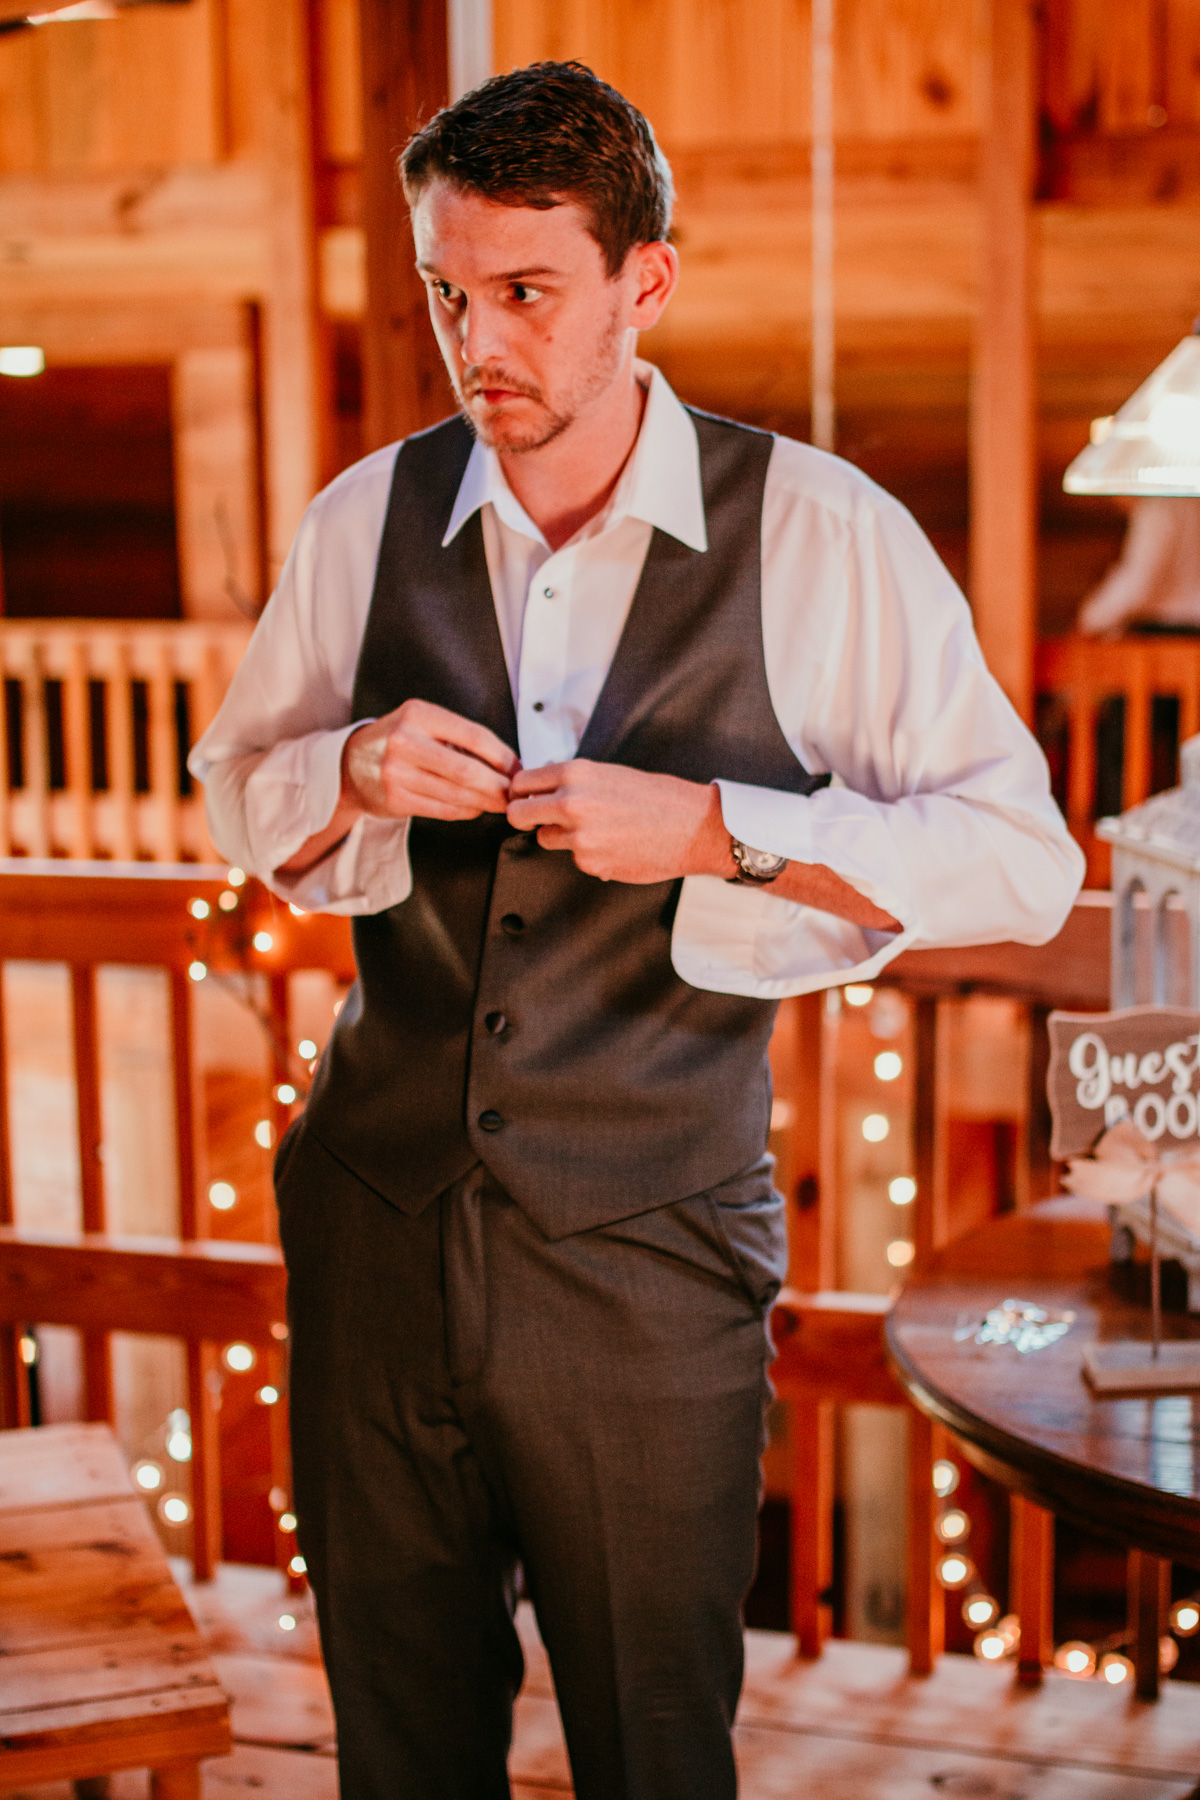 groom-getting-ready-photos.jpg